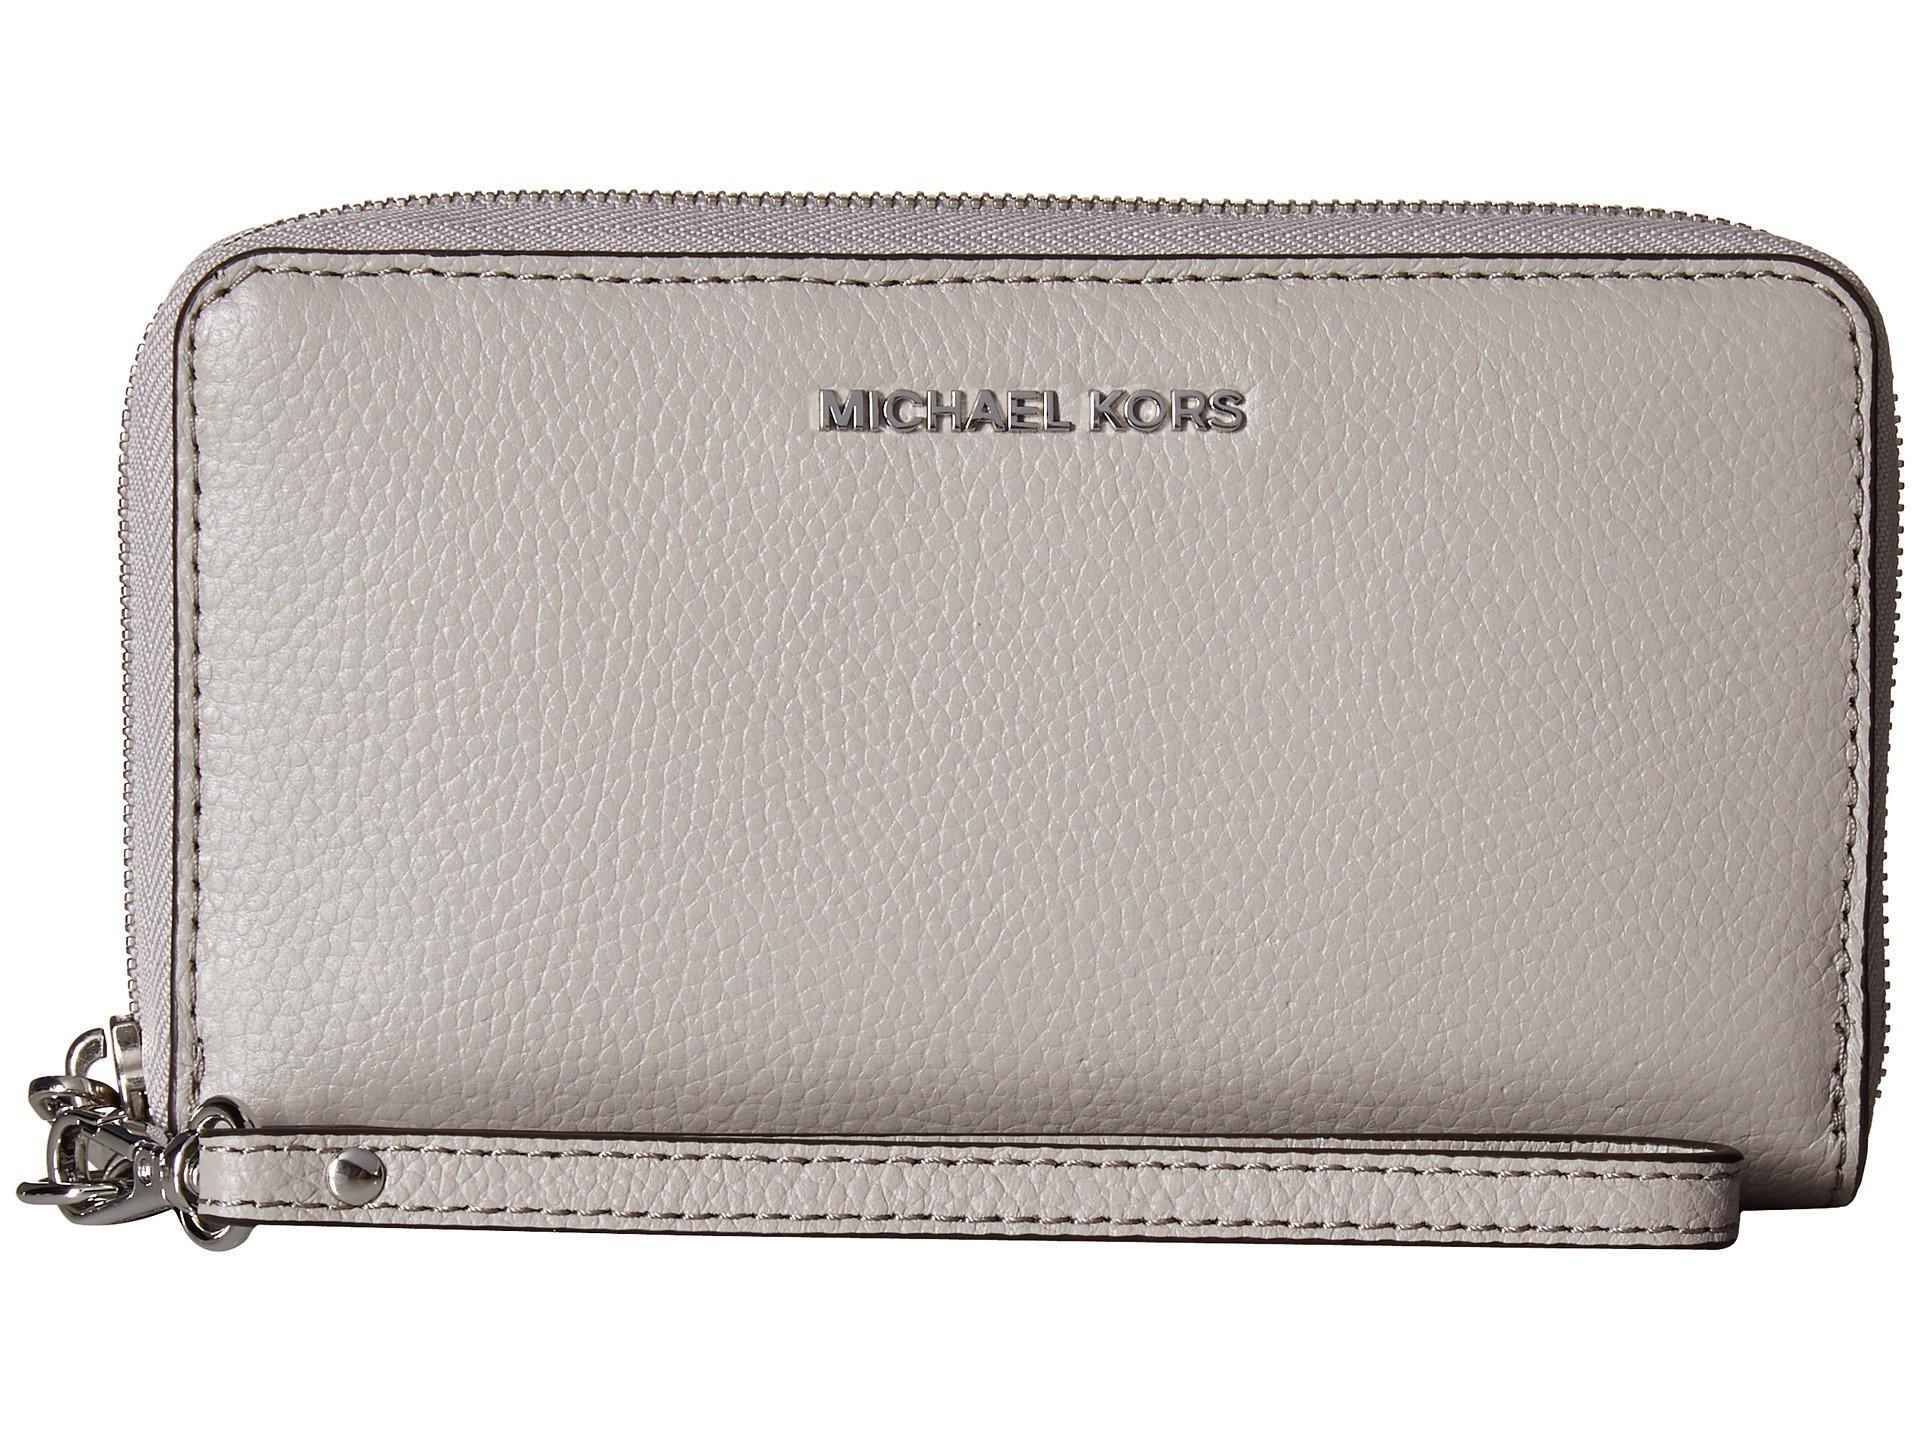 MICHAEL Michael Kors KORS STUDIO Large Flat Phone Case Wristlet Pearl Gray by MICHAEL Michael Kors